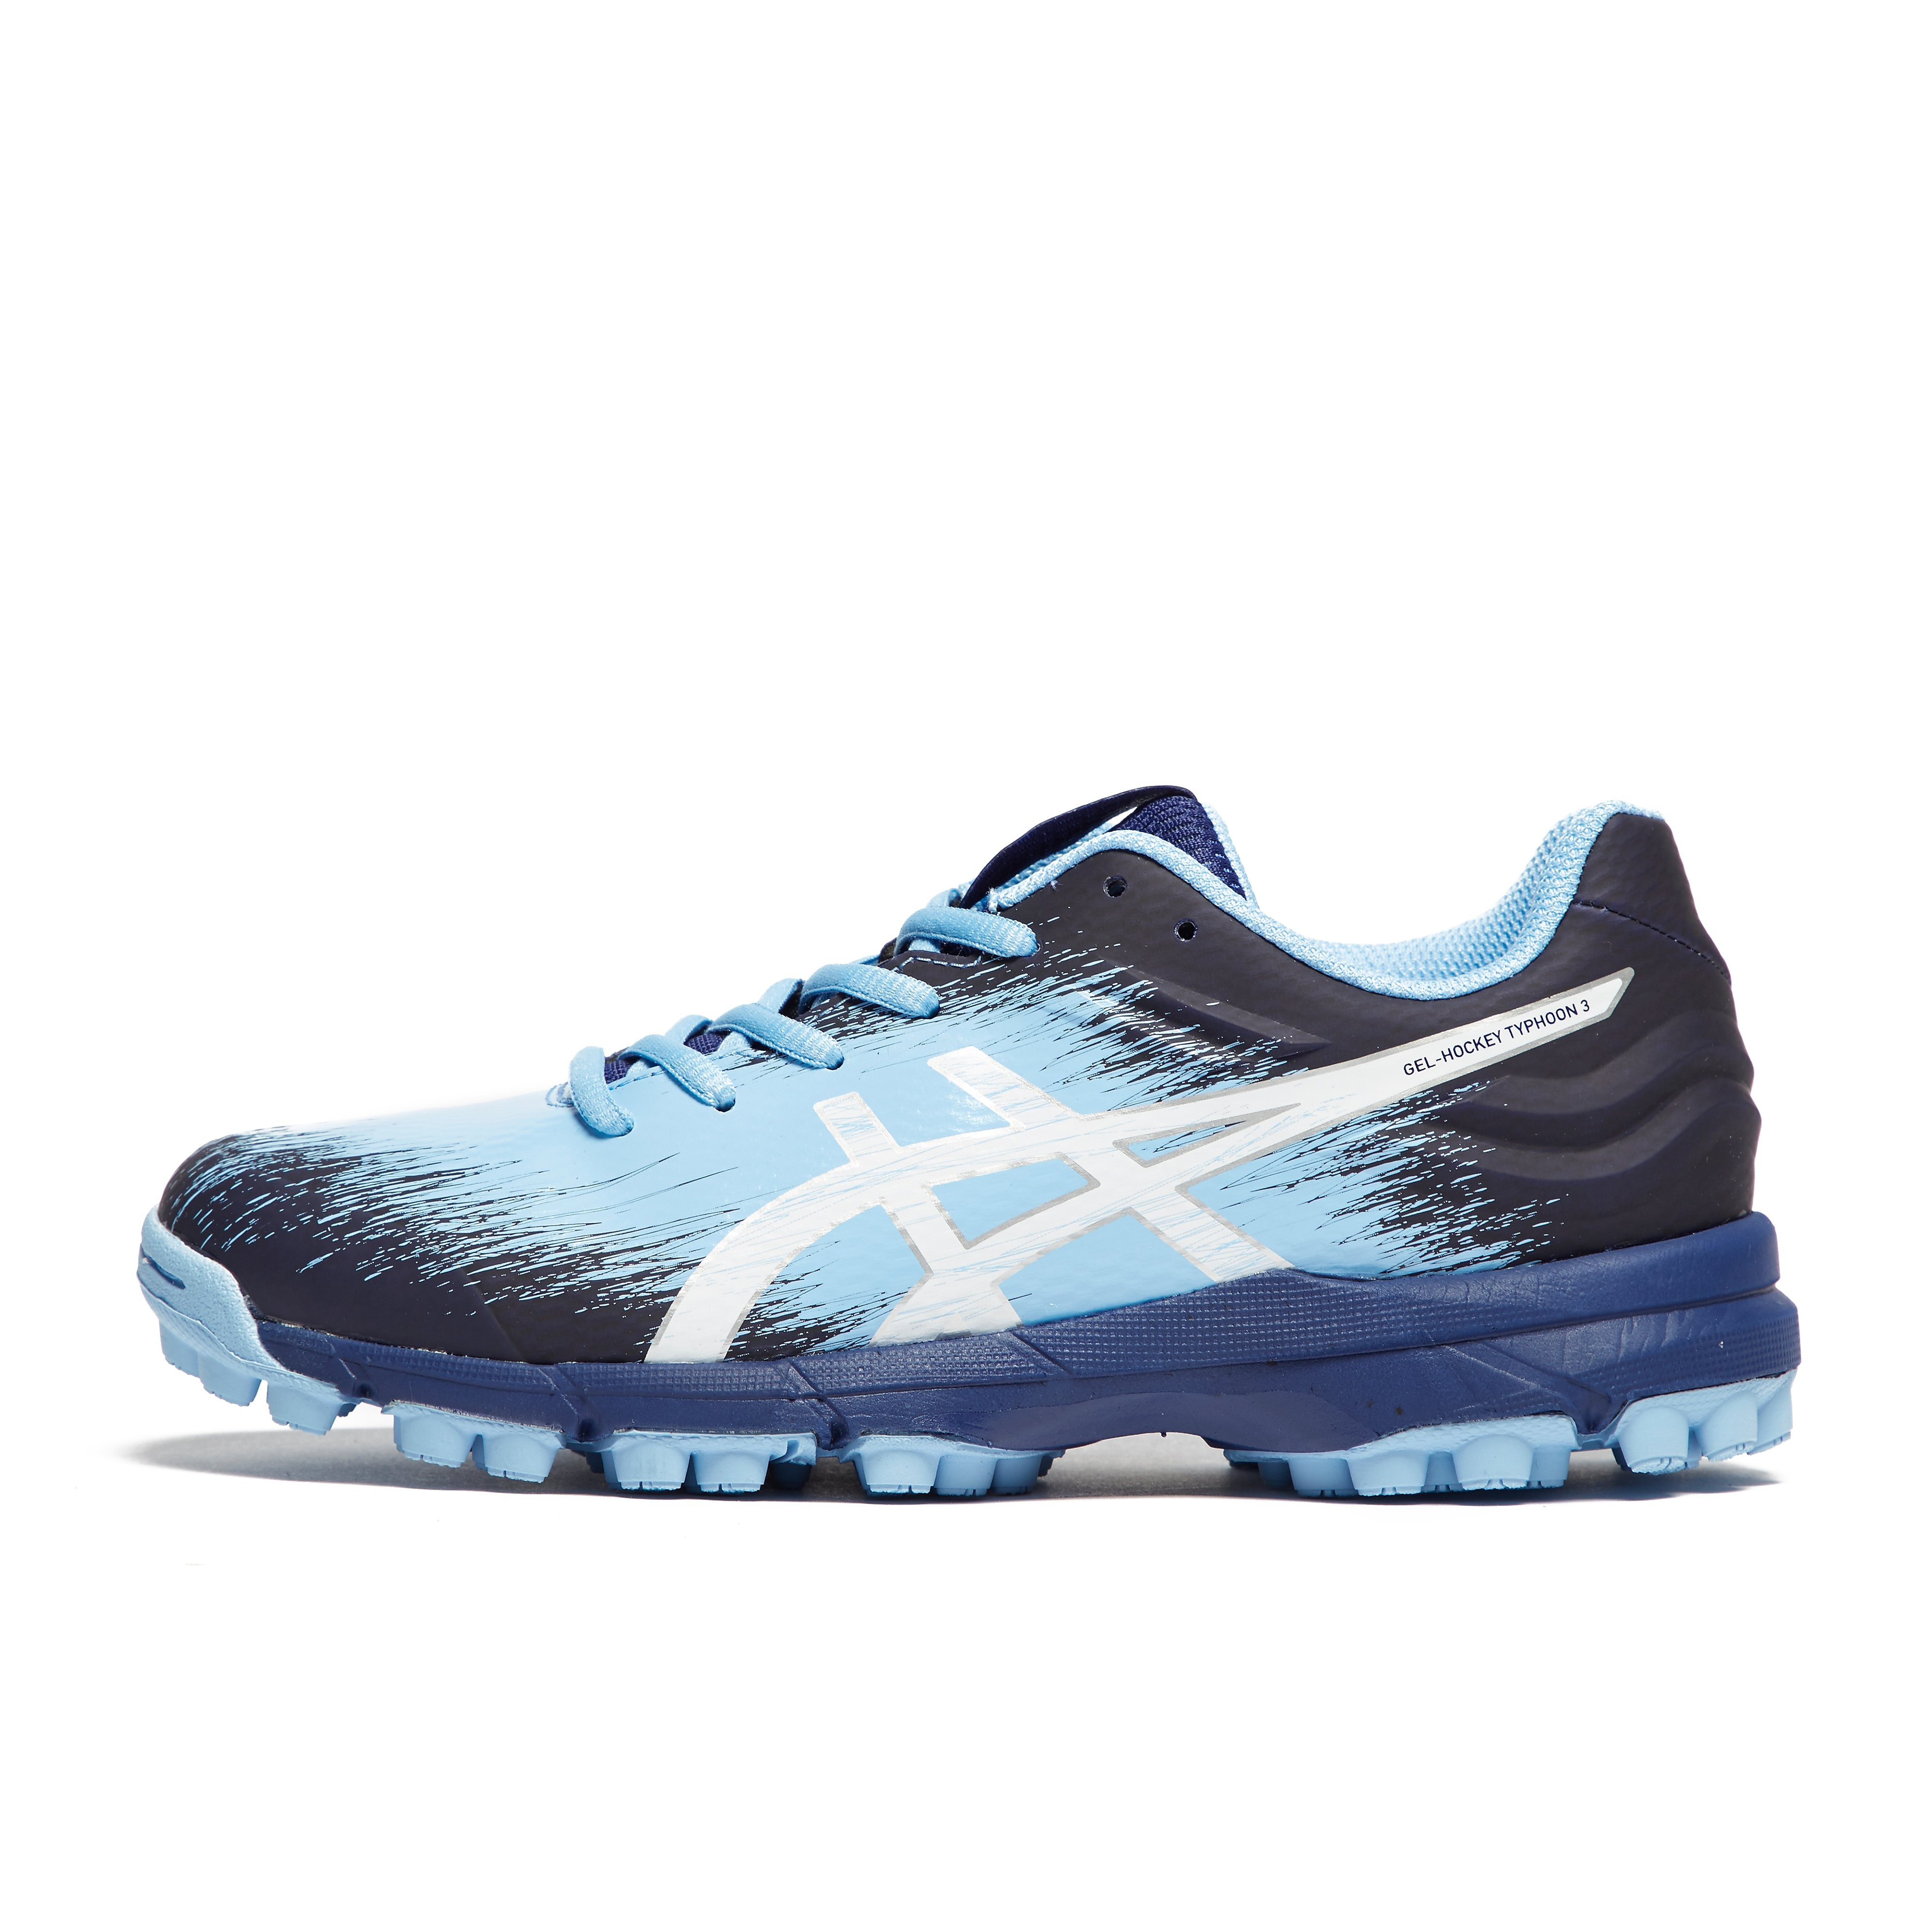 Womens Blue ASICS GEL-Hockey Typhoon 3 Shoes